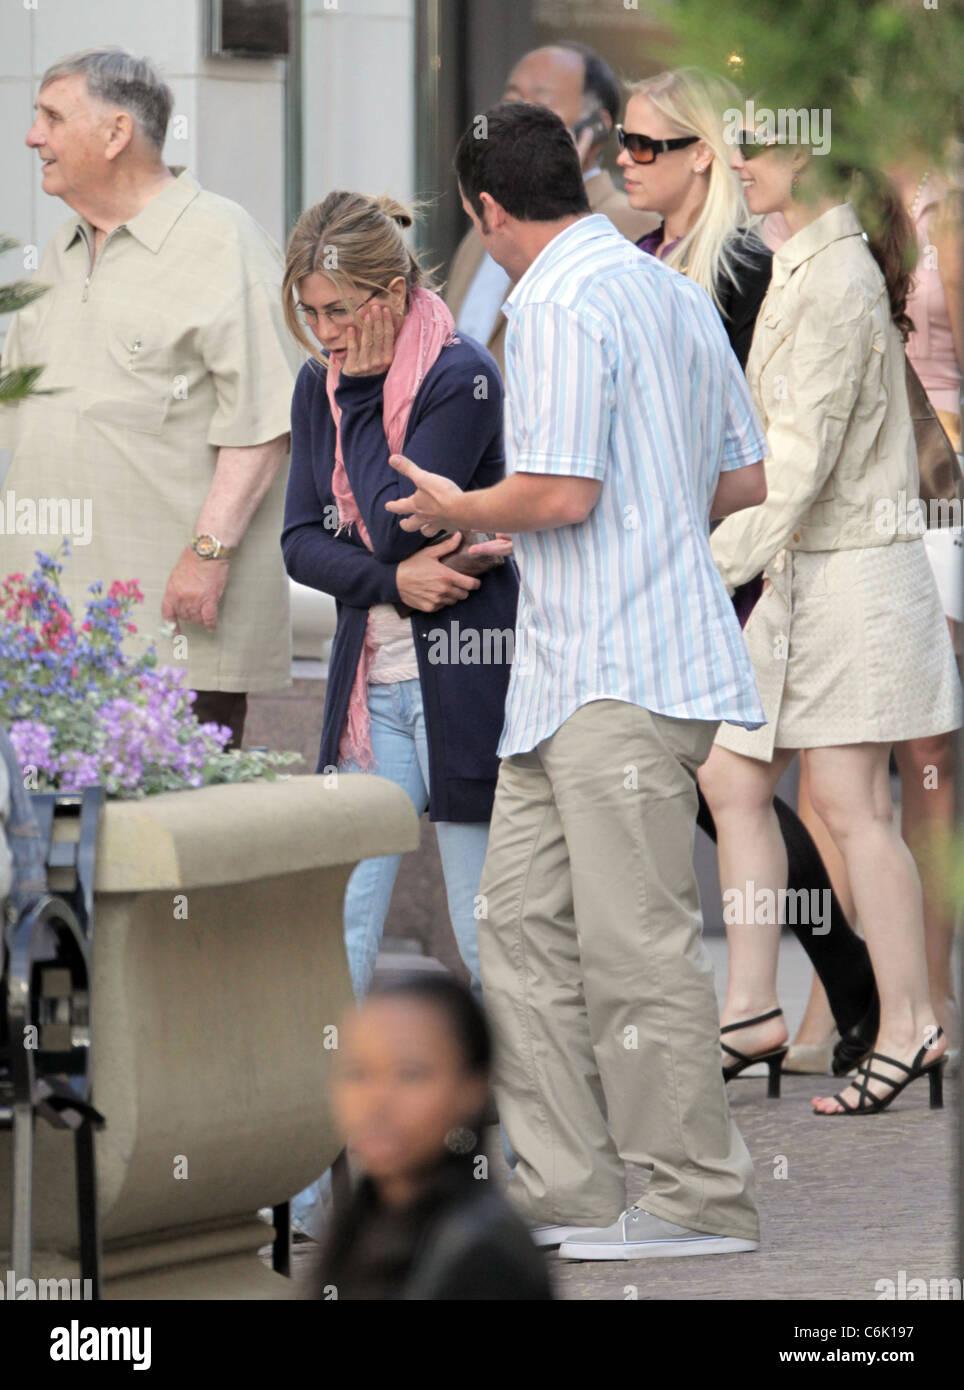 Actors Jennifer Aniston and Adam Sandler filming their new